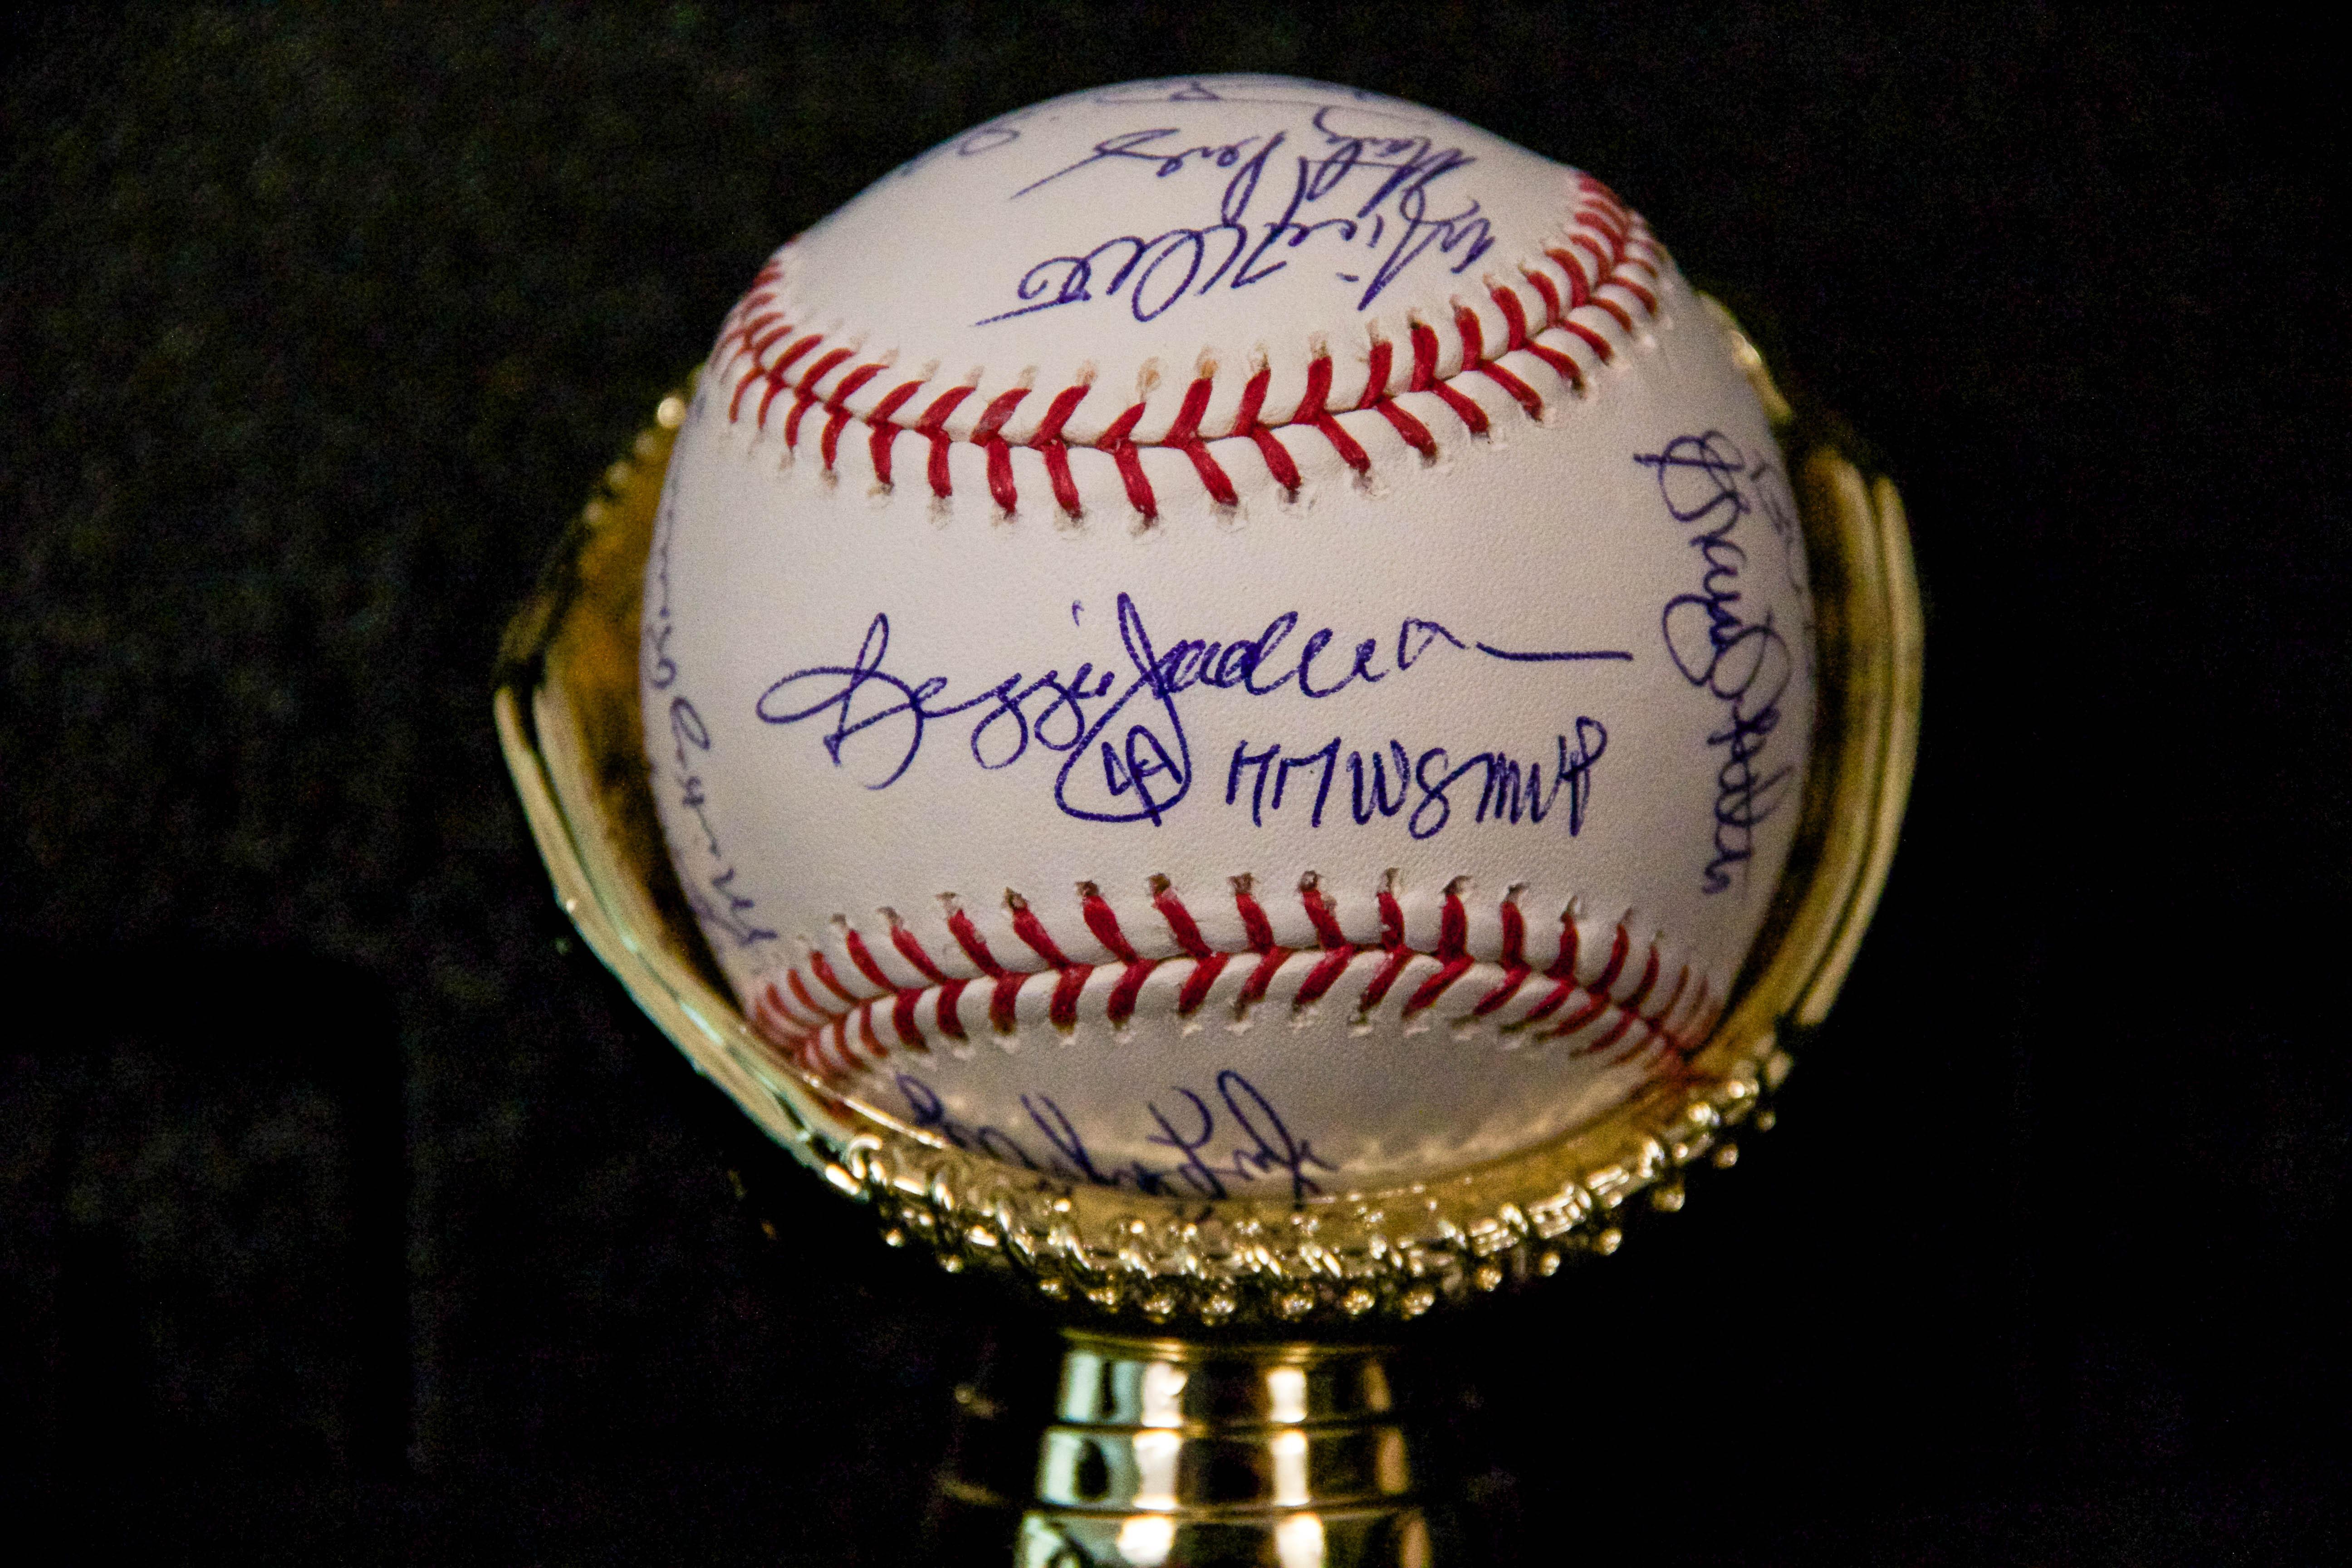 1977 World Series Champions